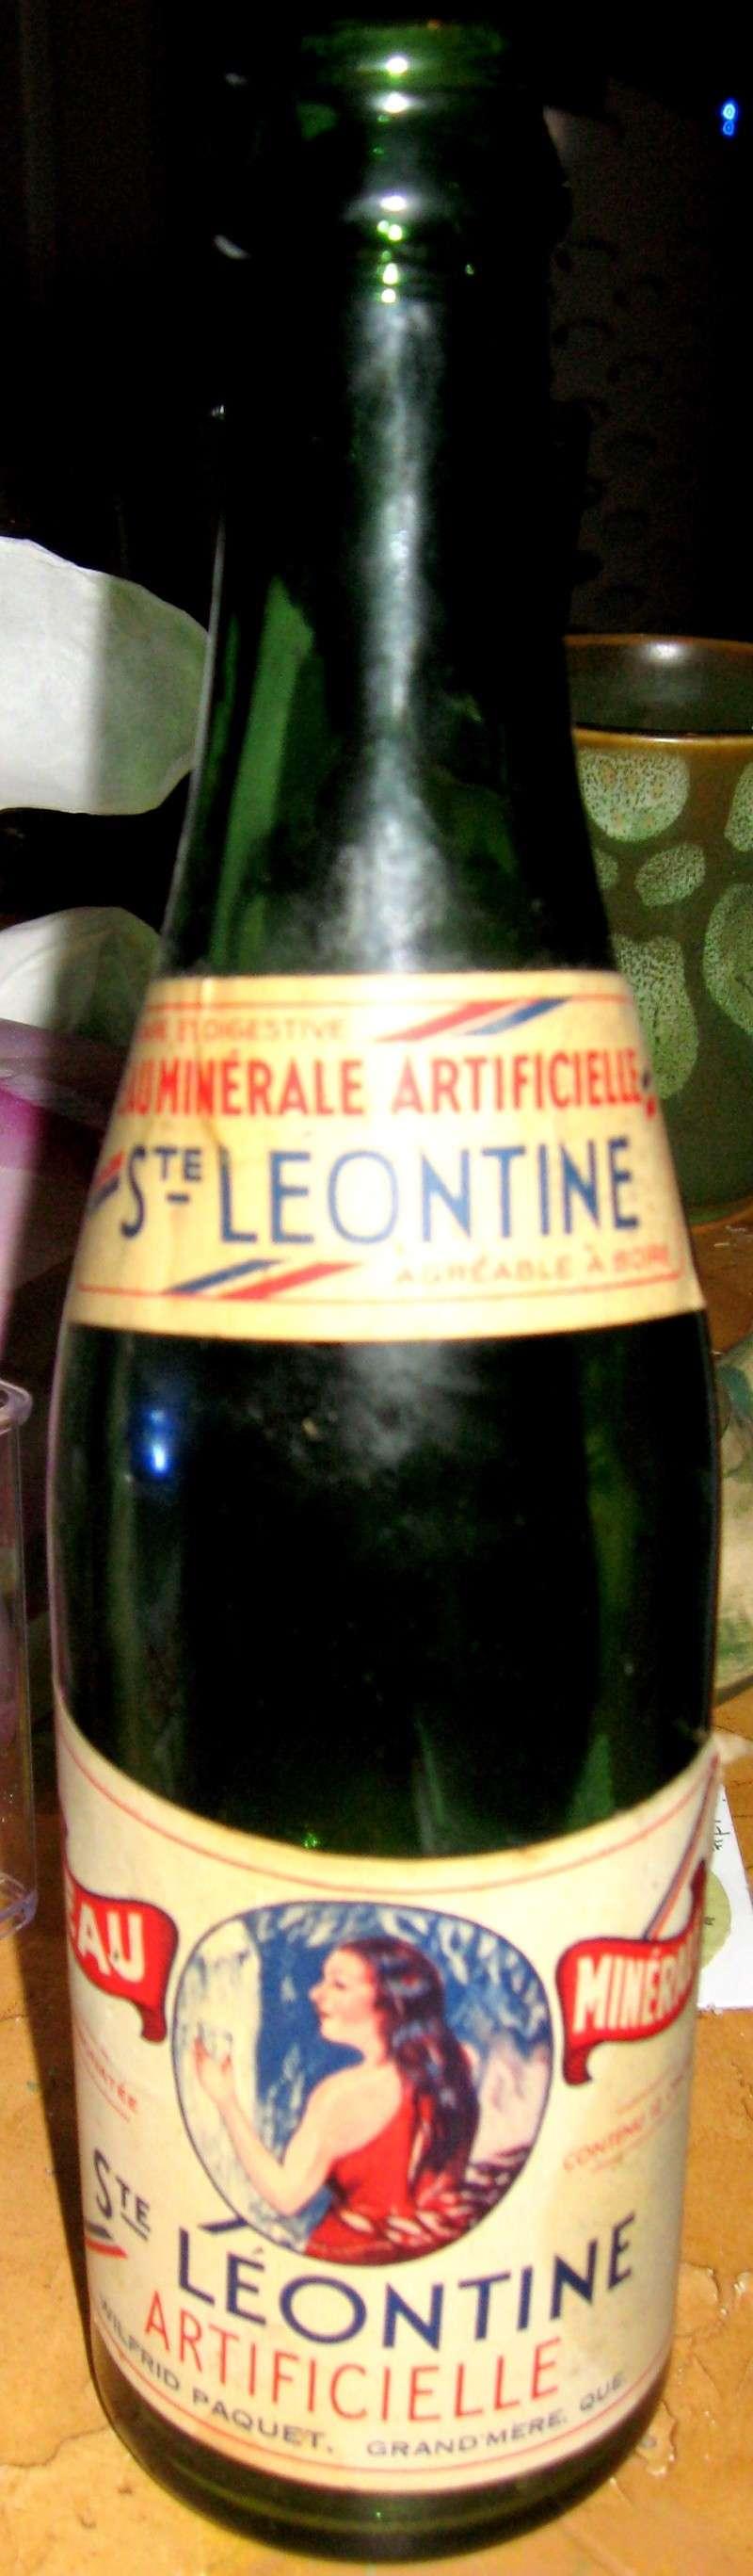 Eau minérale Ste-Leontine - Wilfrid Paquet Grand'Mère, PQ  Img_7810